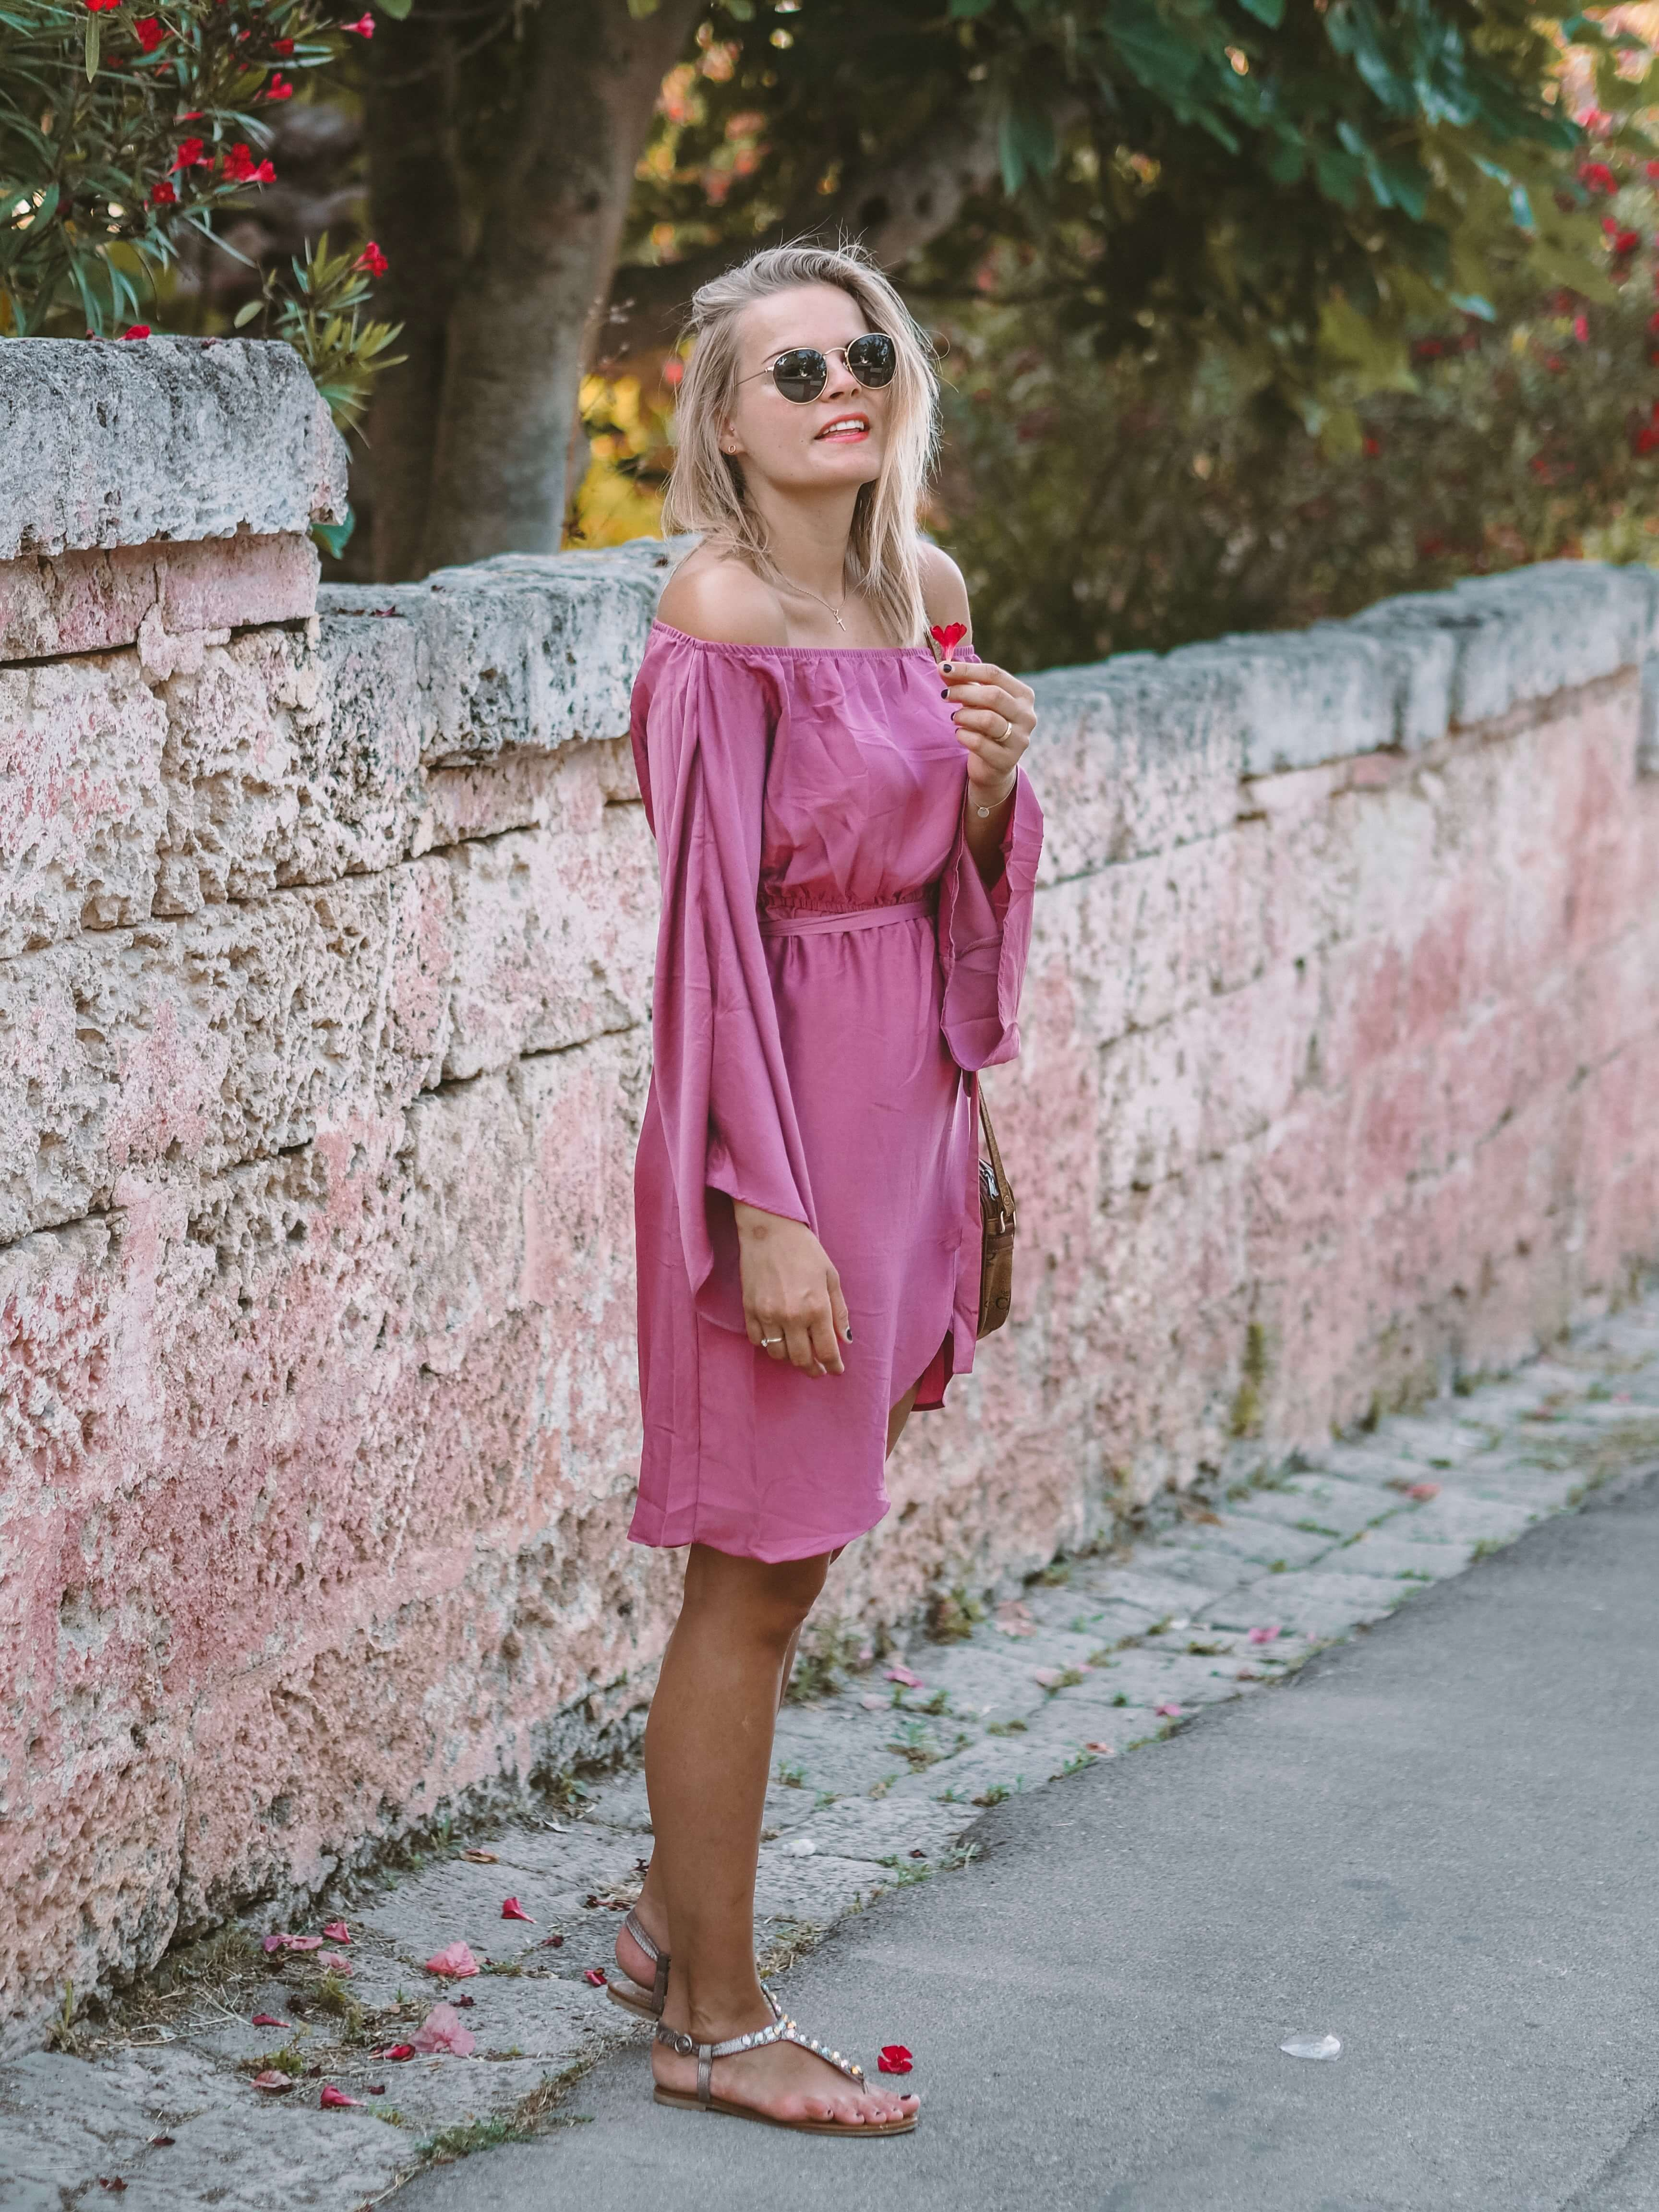 Outfit A Little Touch Of Pink La Katy Fox Sommerkleid Kurz Modestil Kleider